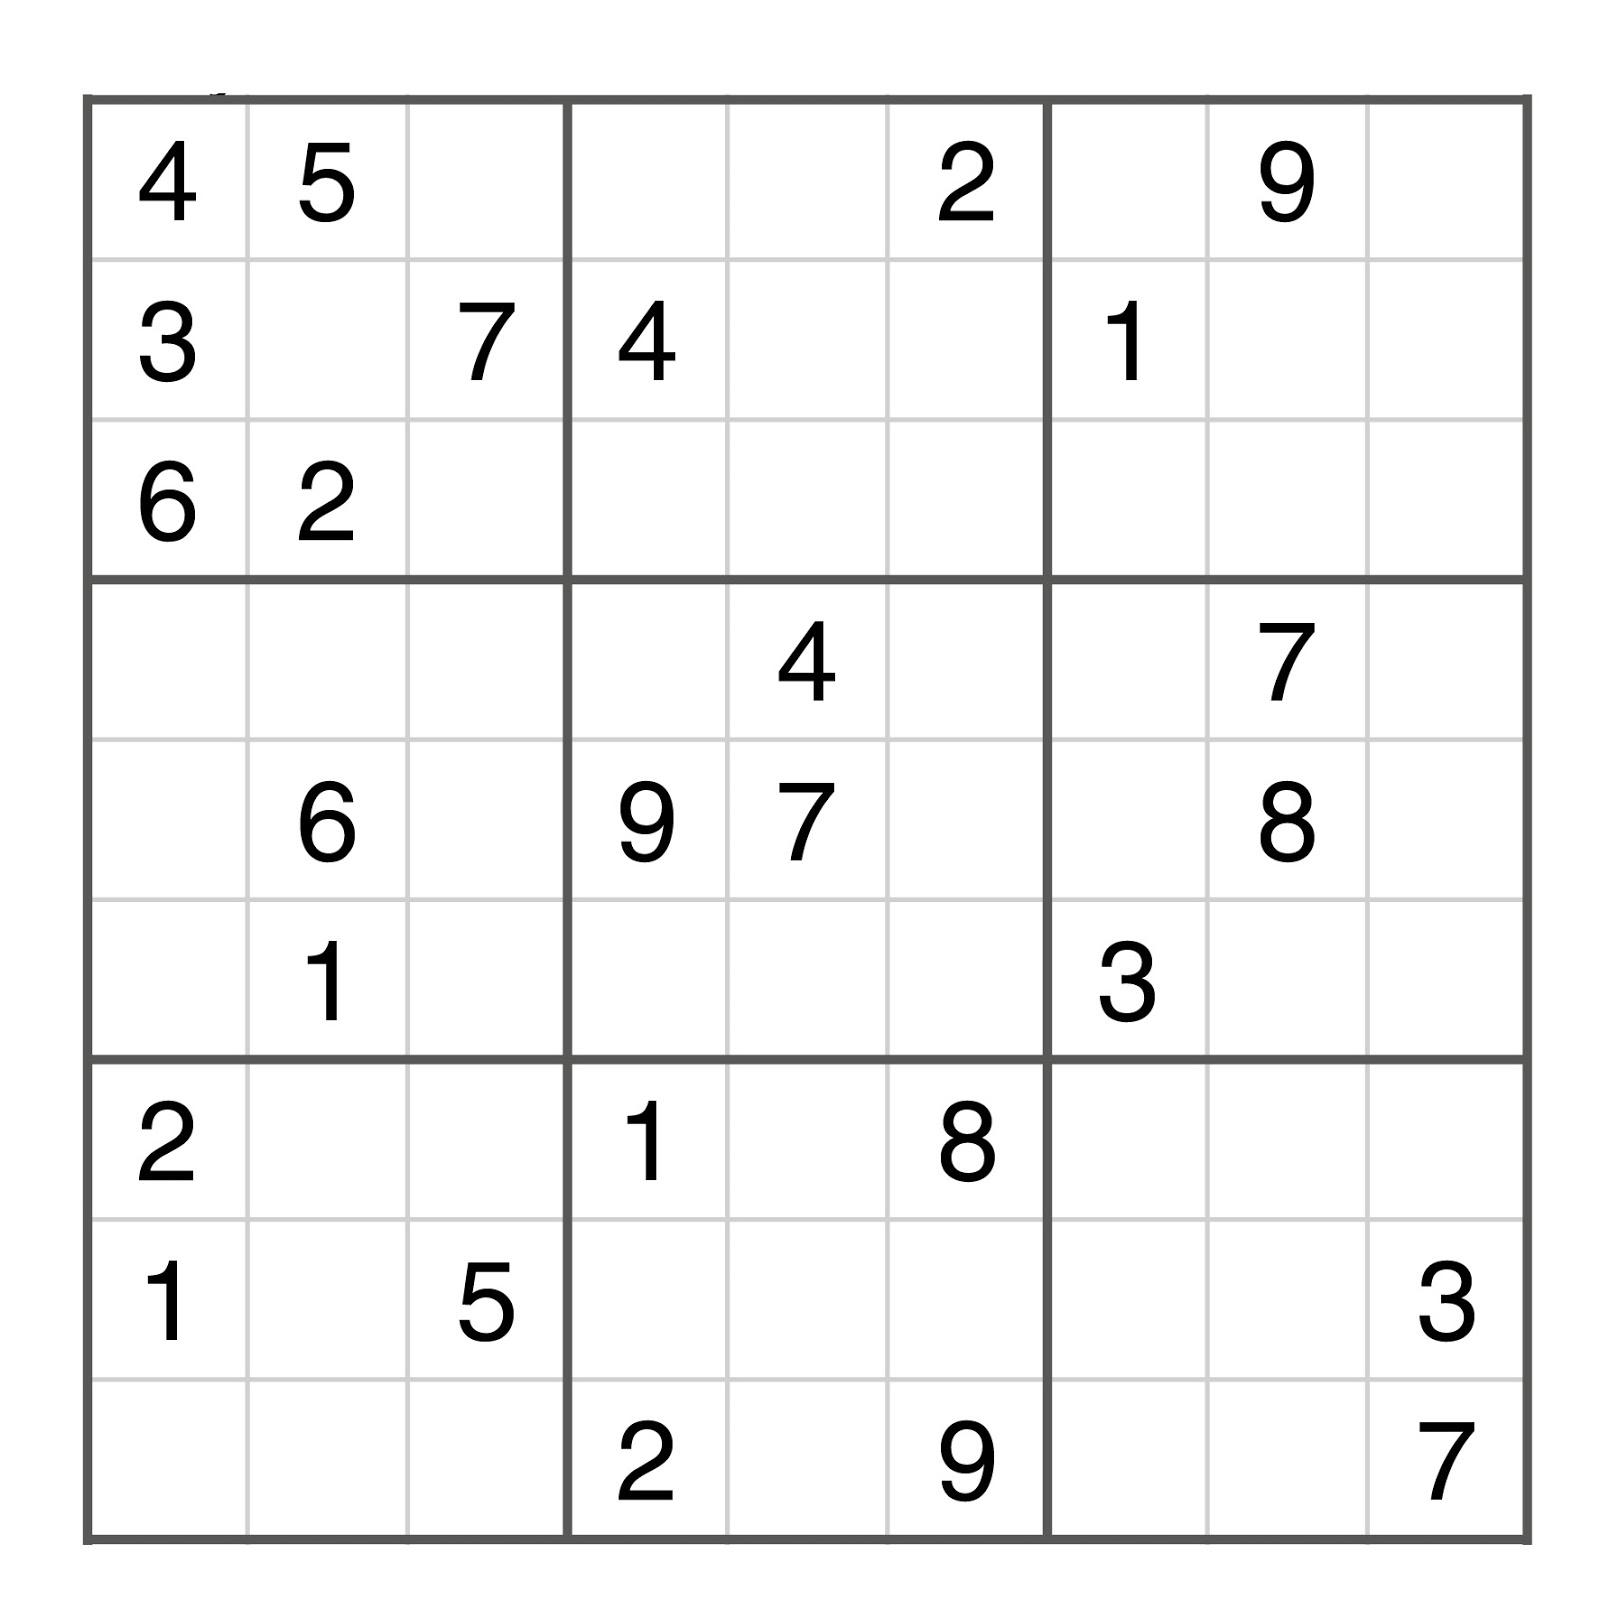 Sudoku gratuit en ligne grille sudoku imprimer sudoku - Grille sudoku a imprimer gratuitement ...